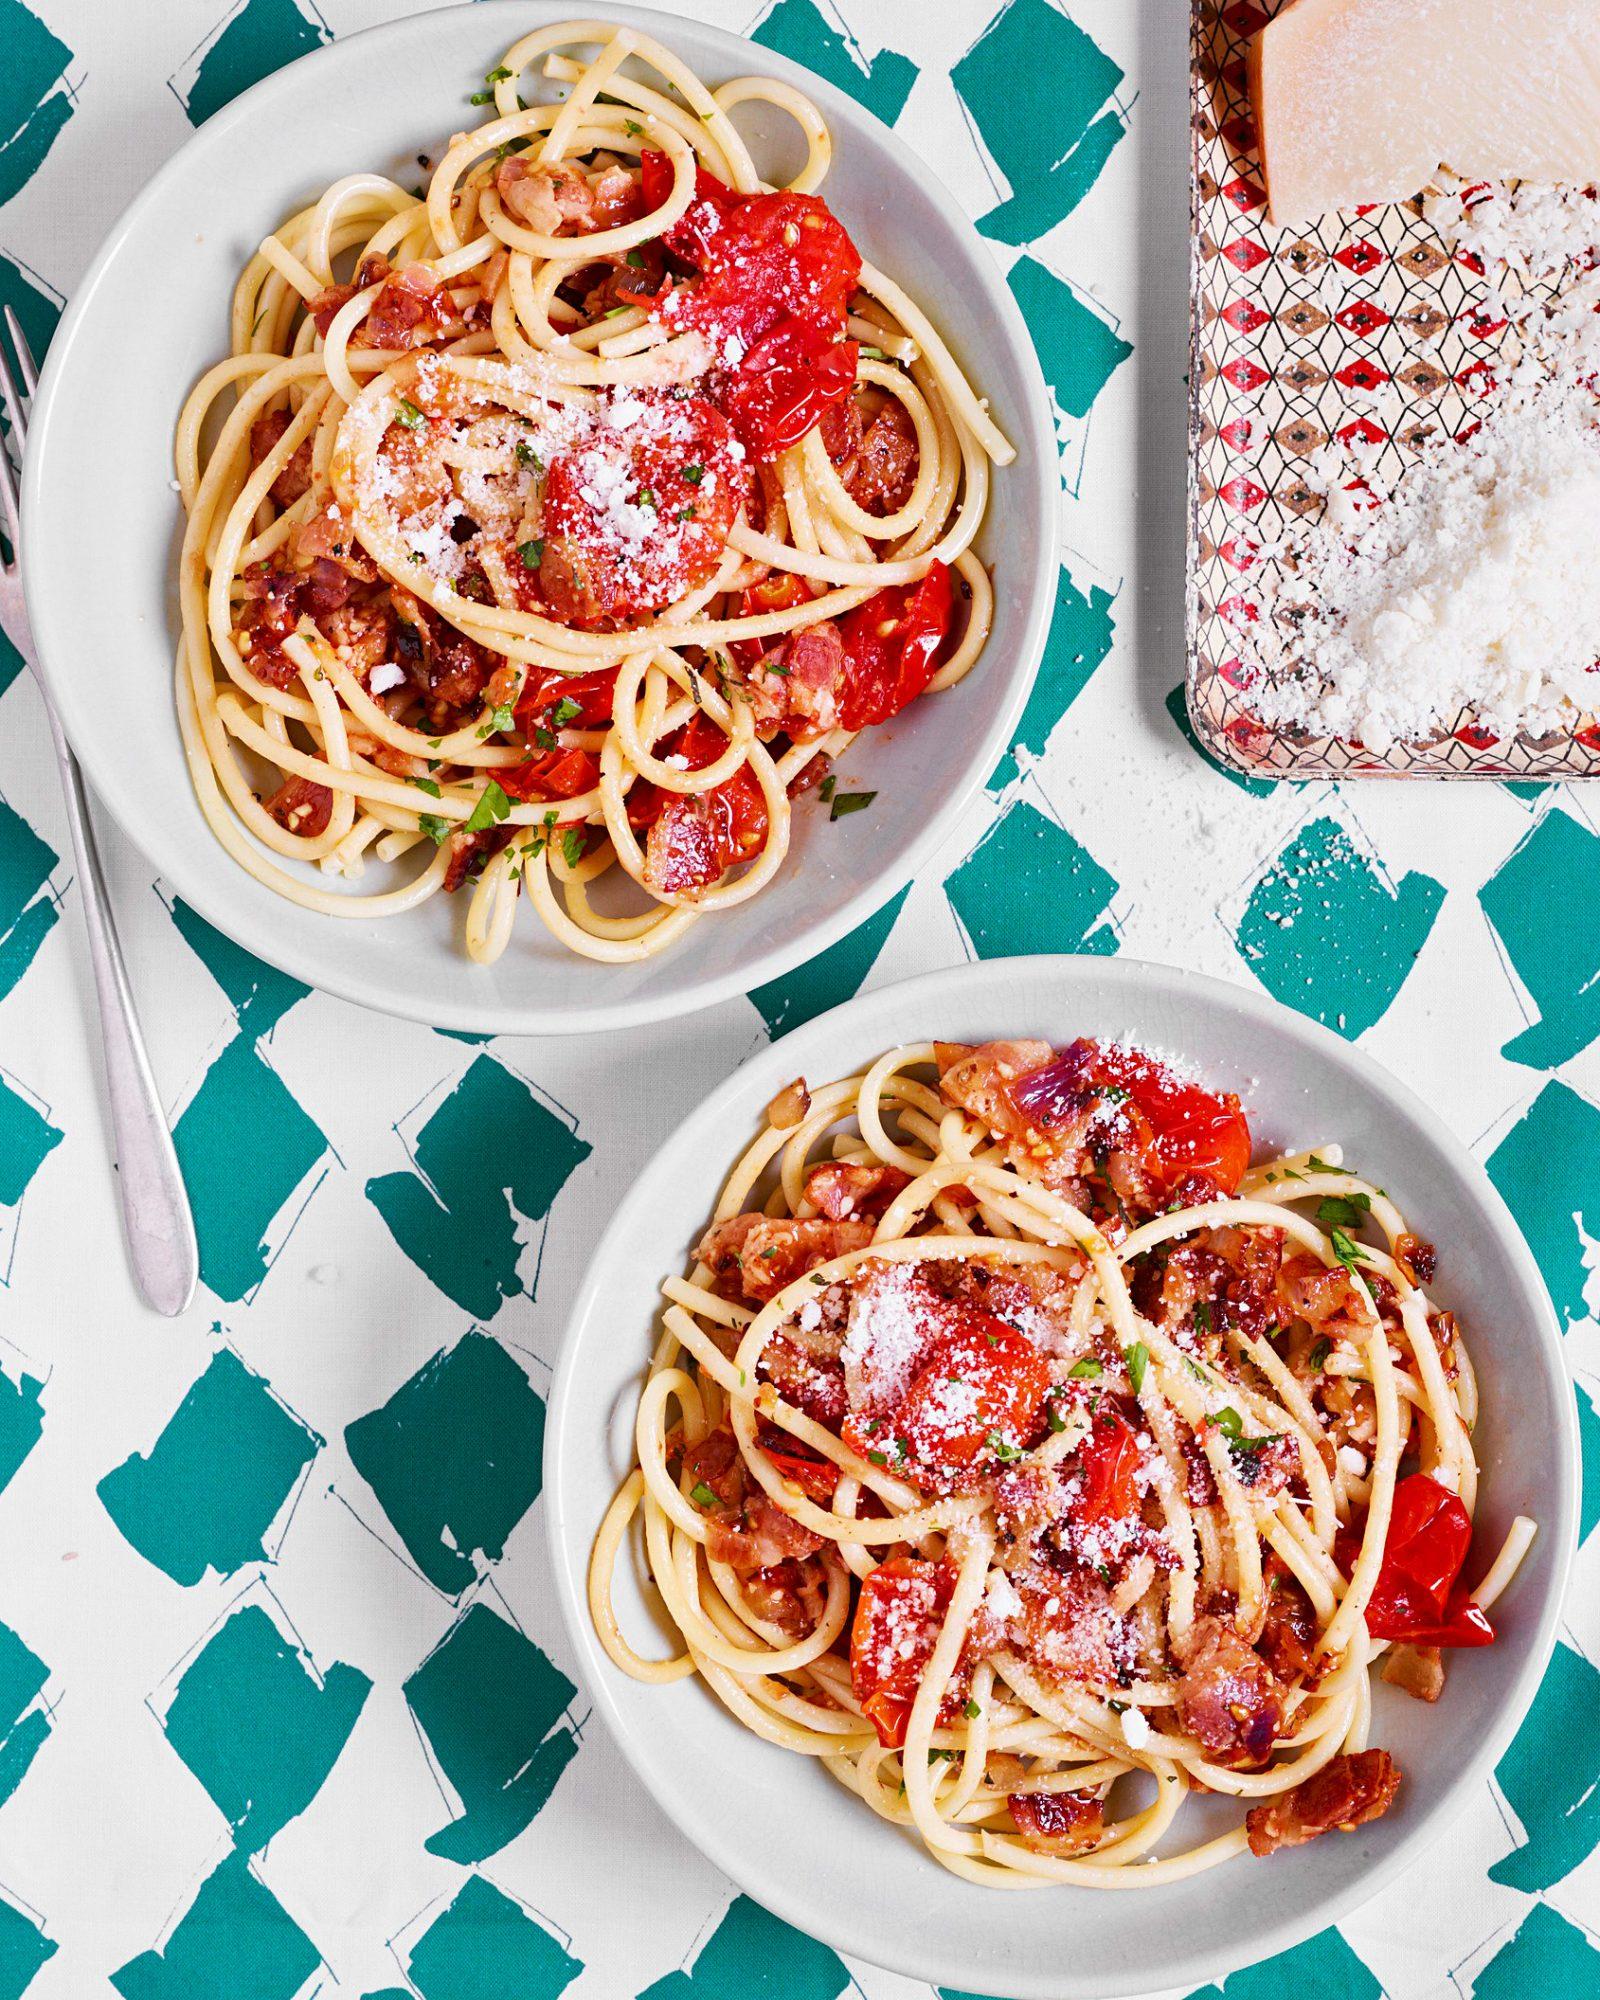 Fat Spaghetti with Bacon & Cherry Tomato Sauce